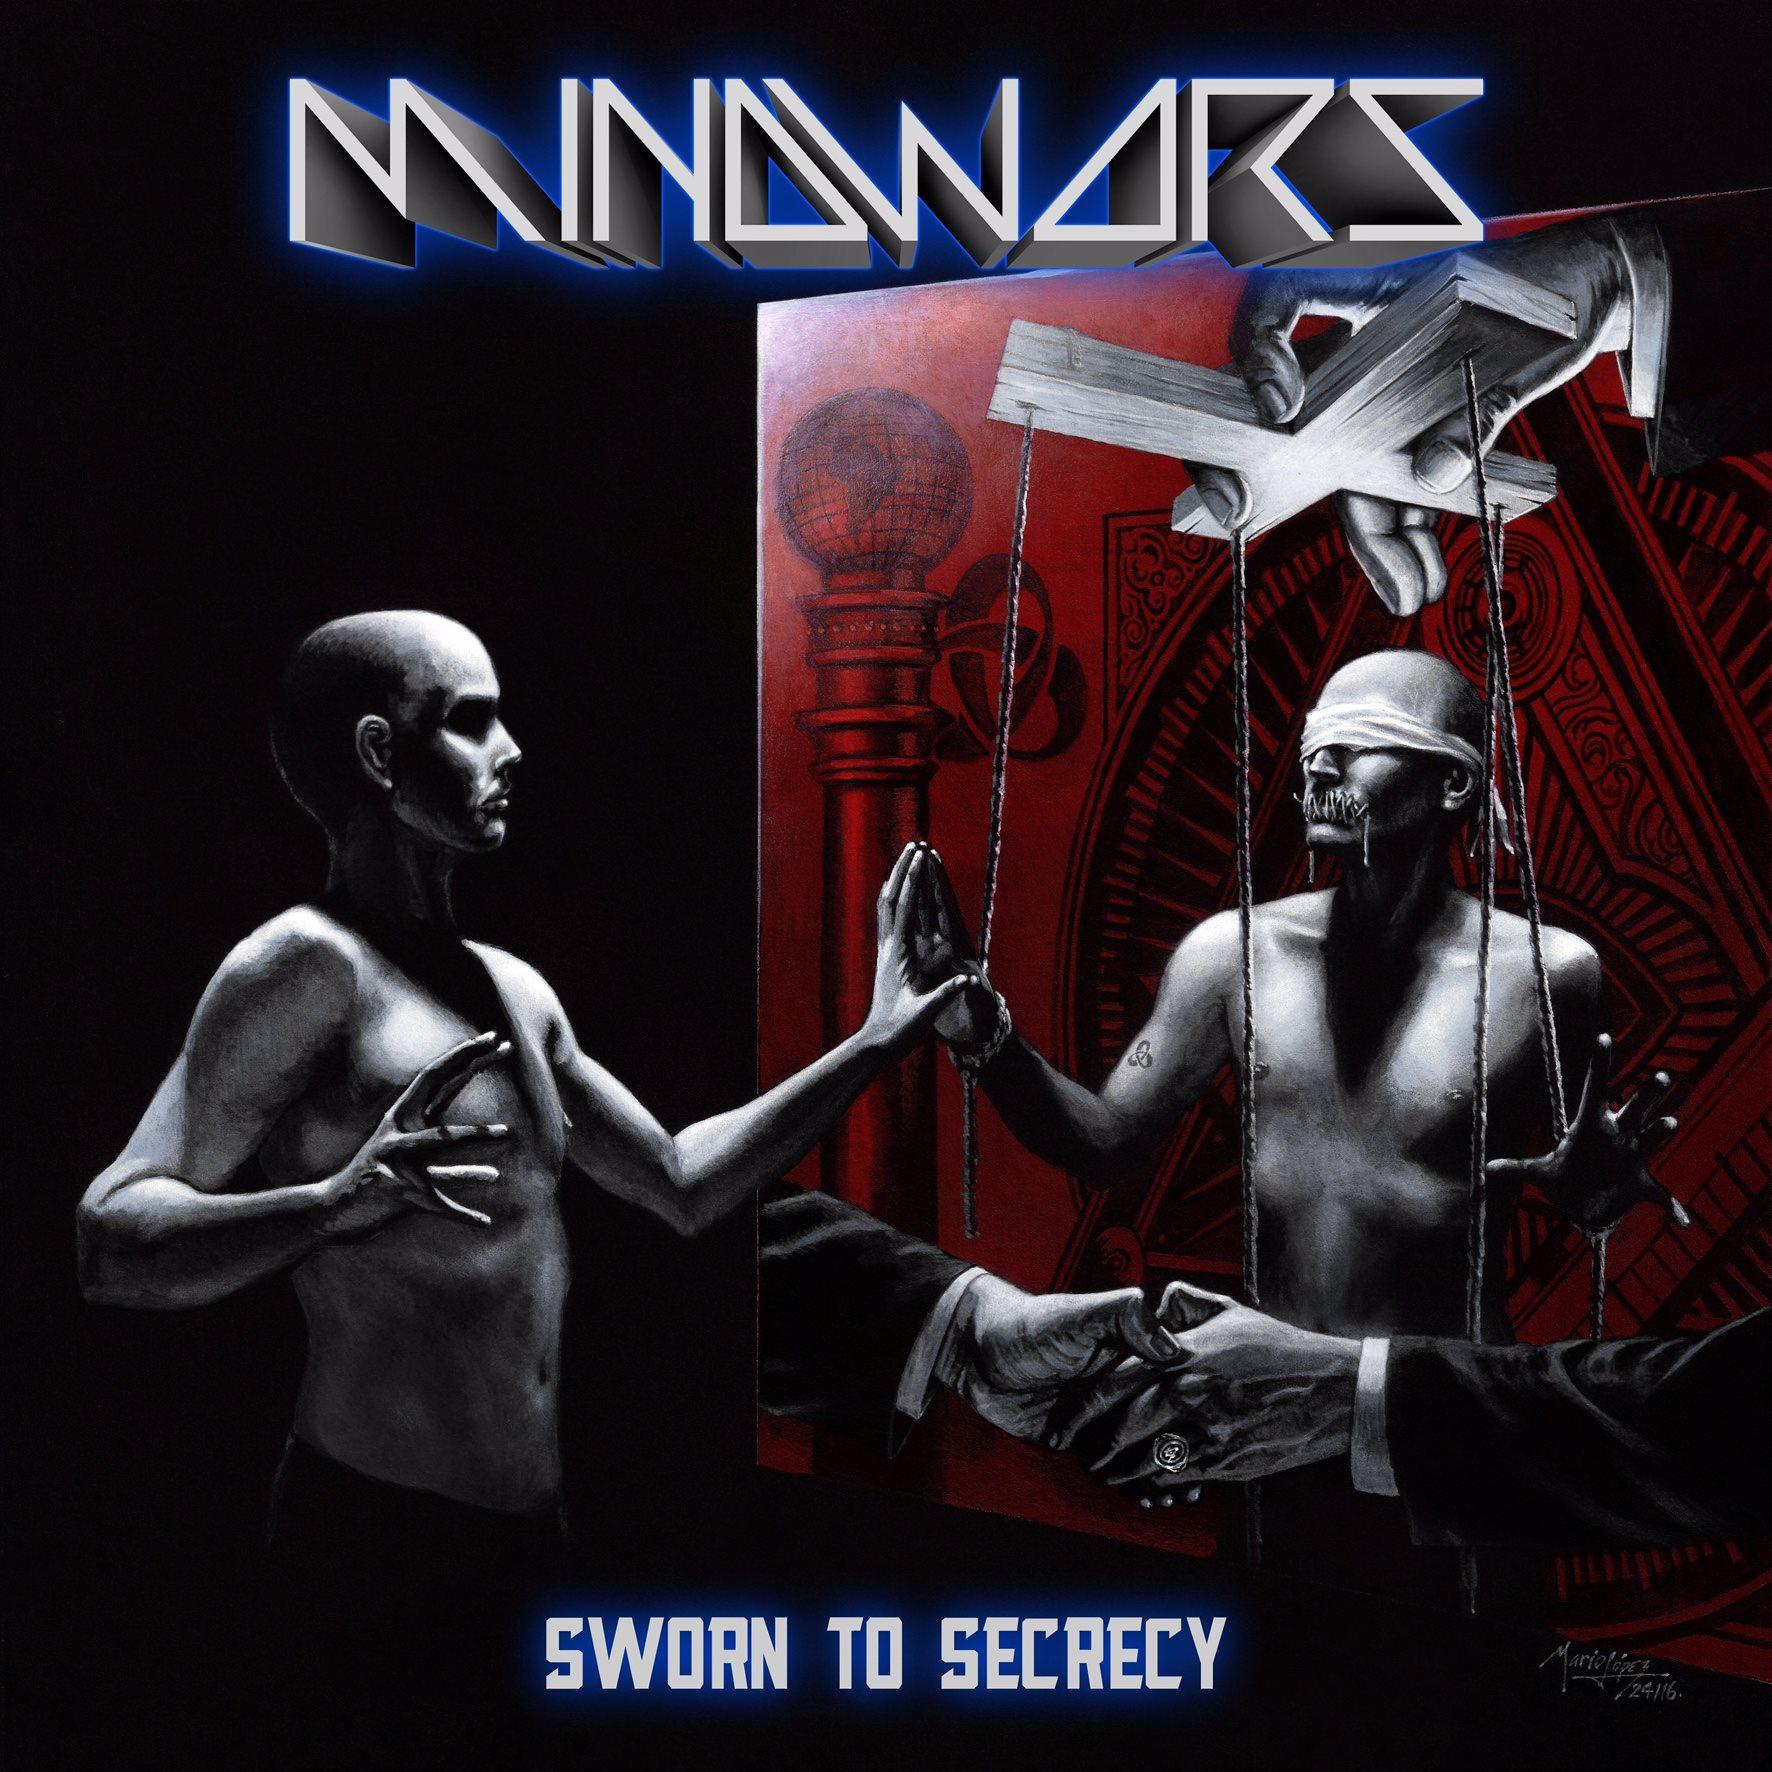 Mindwars, 'Sworn To Secrecy', Punishment 18 Records (2016), artwork by Mario Lopez